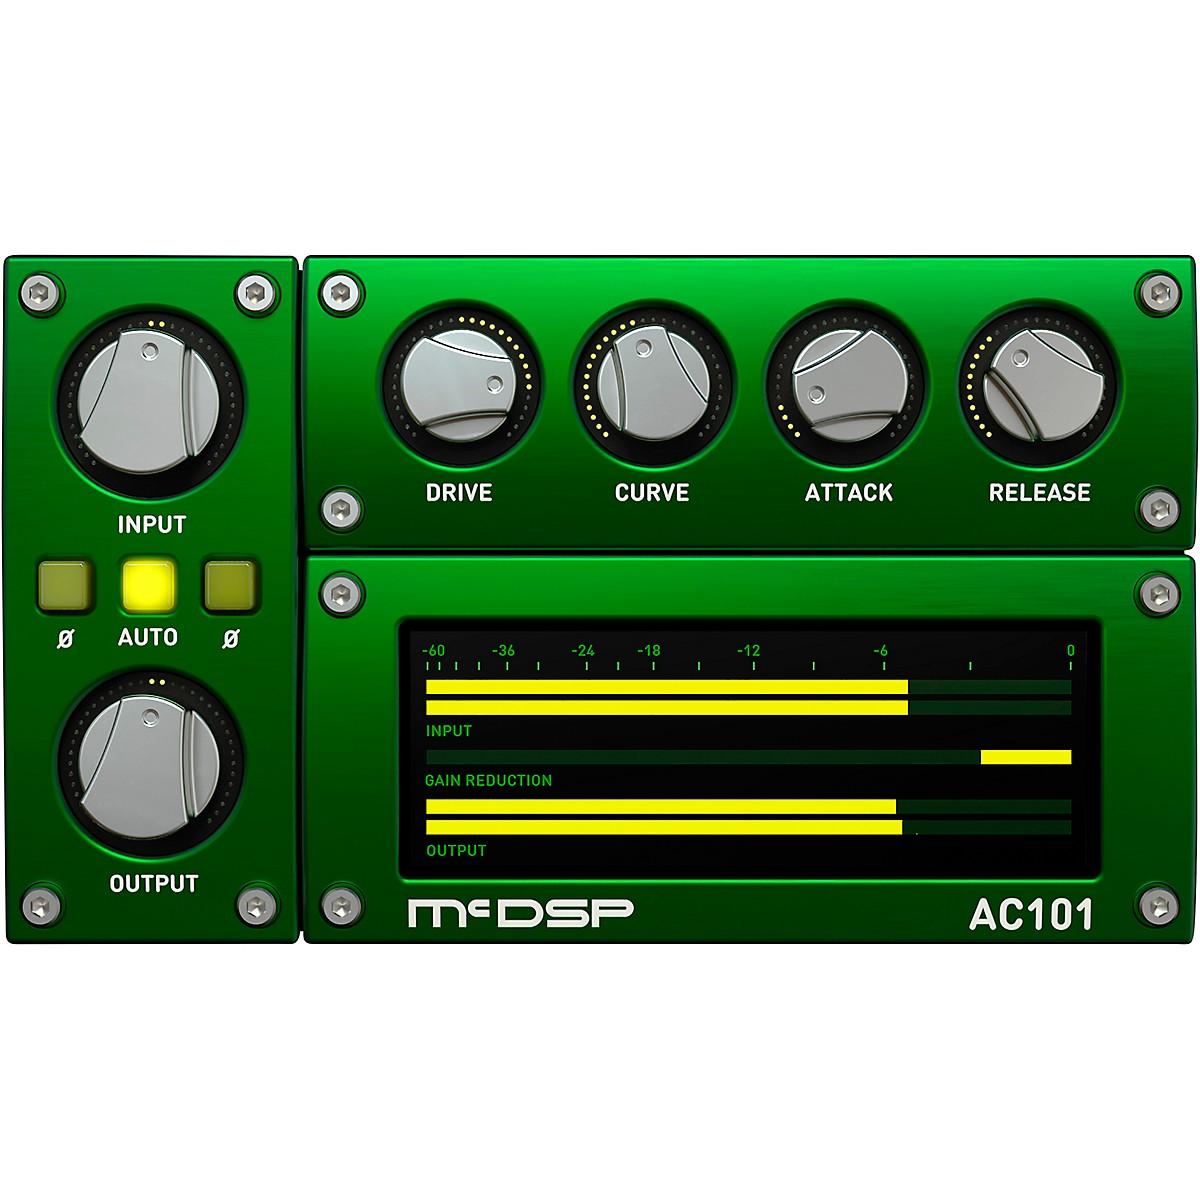 McDSP Analog Channel HD v6 (Software Download)